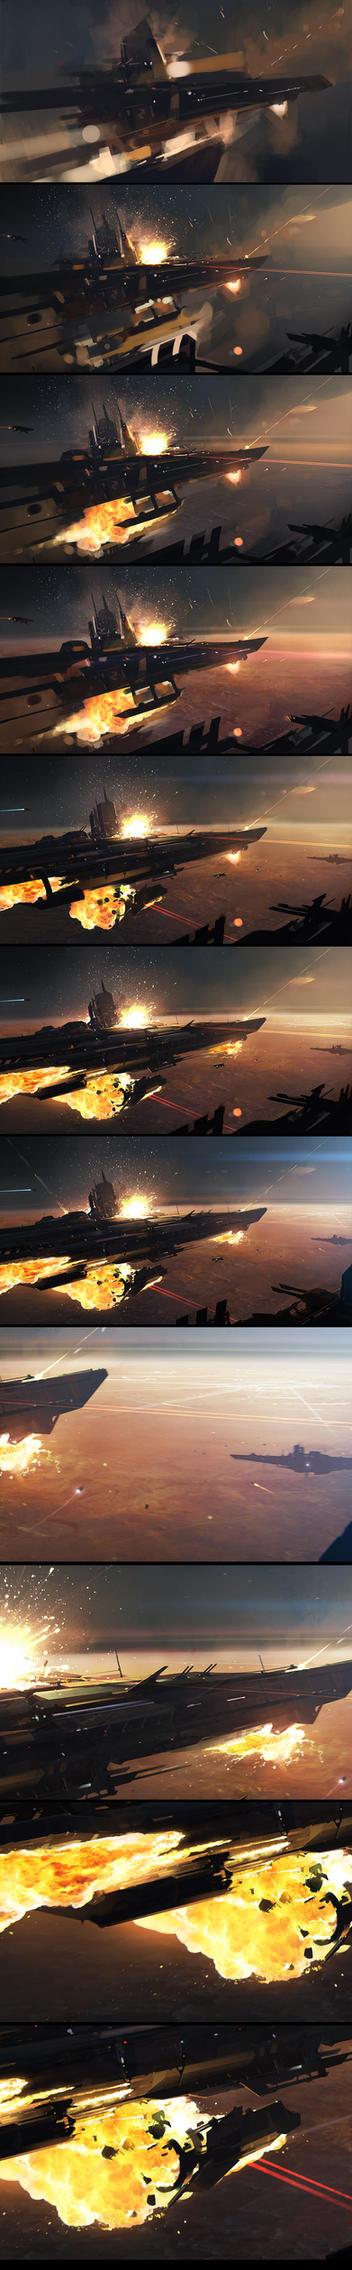 Making of 'Goodbye' by jamajurabaev